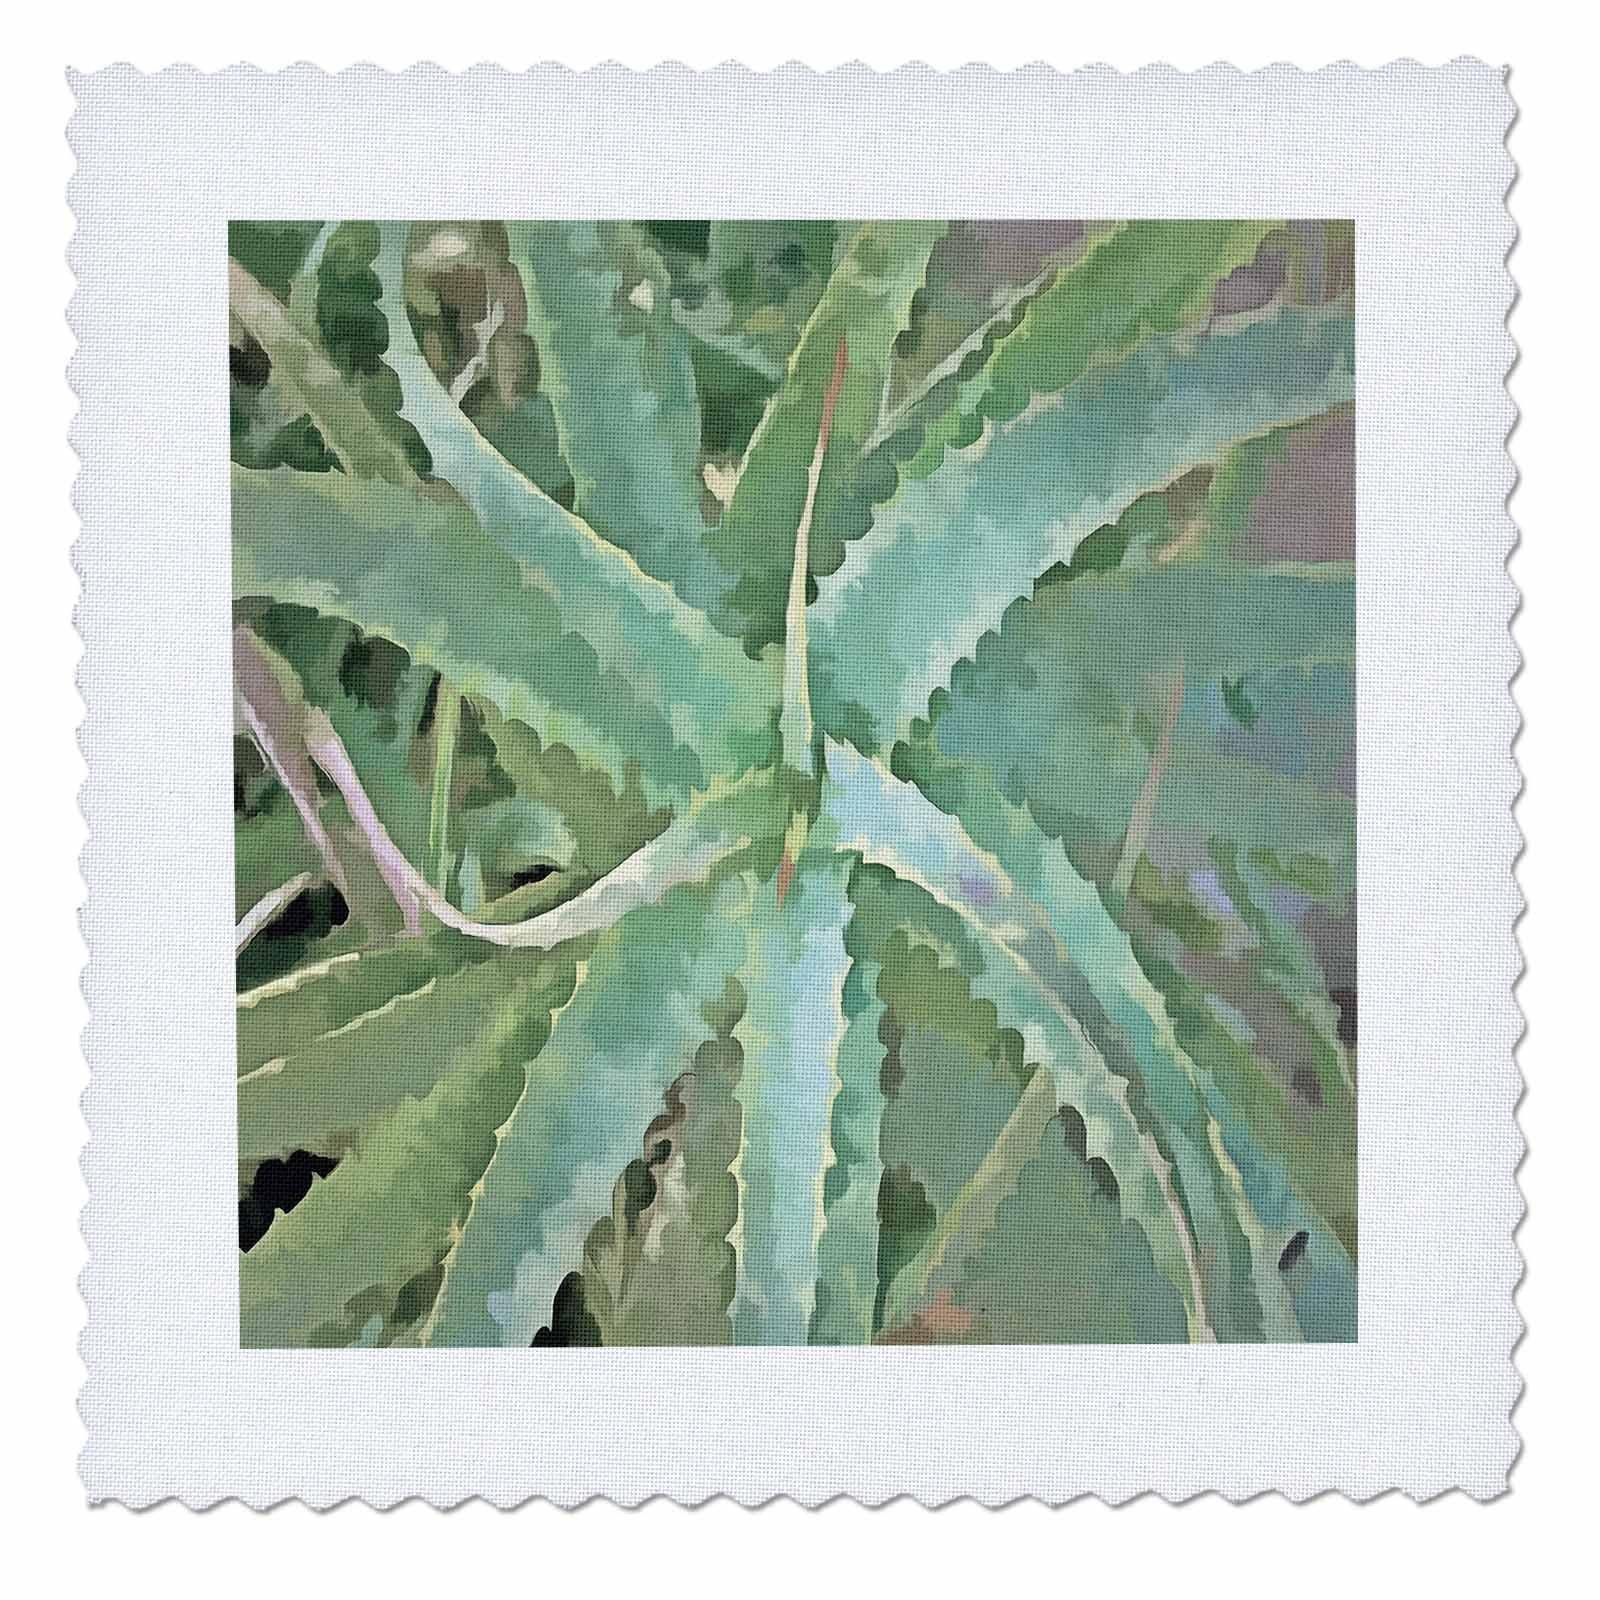 3dRose Taiche - Acrylic Painting - Aloe Vera - Amazing Aloe Vera - 12x12 inch quilt square (qs_260789_4)